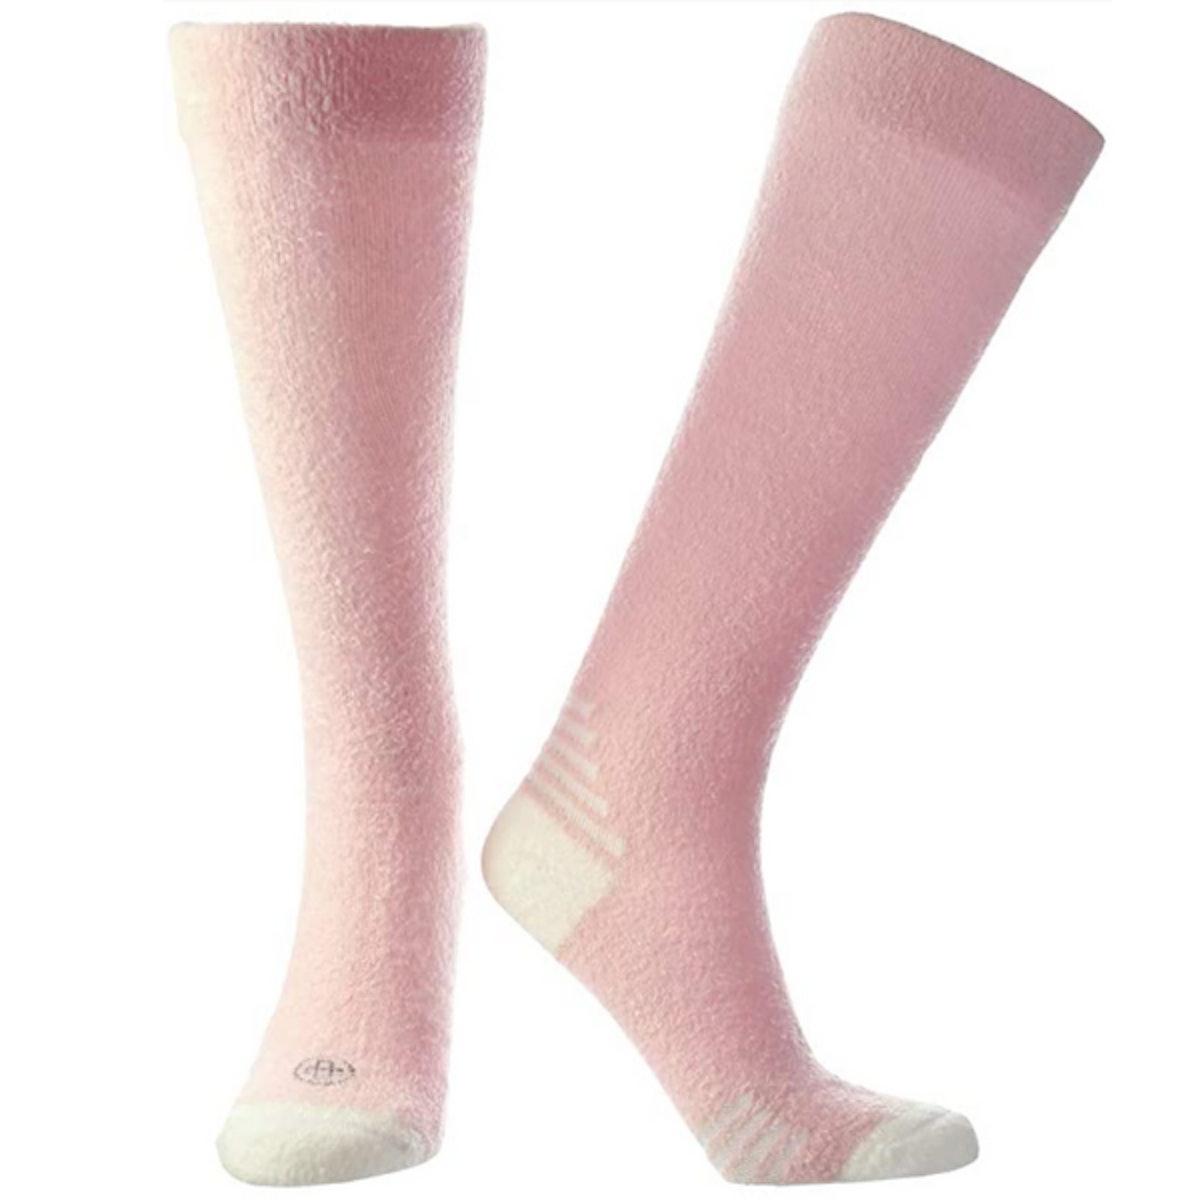 Doctor's Choice Fuzzy Compression Socks